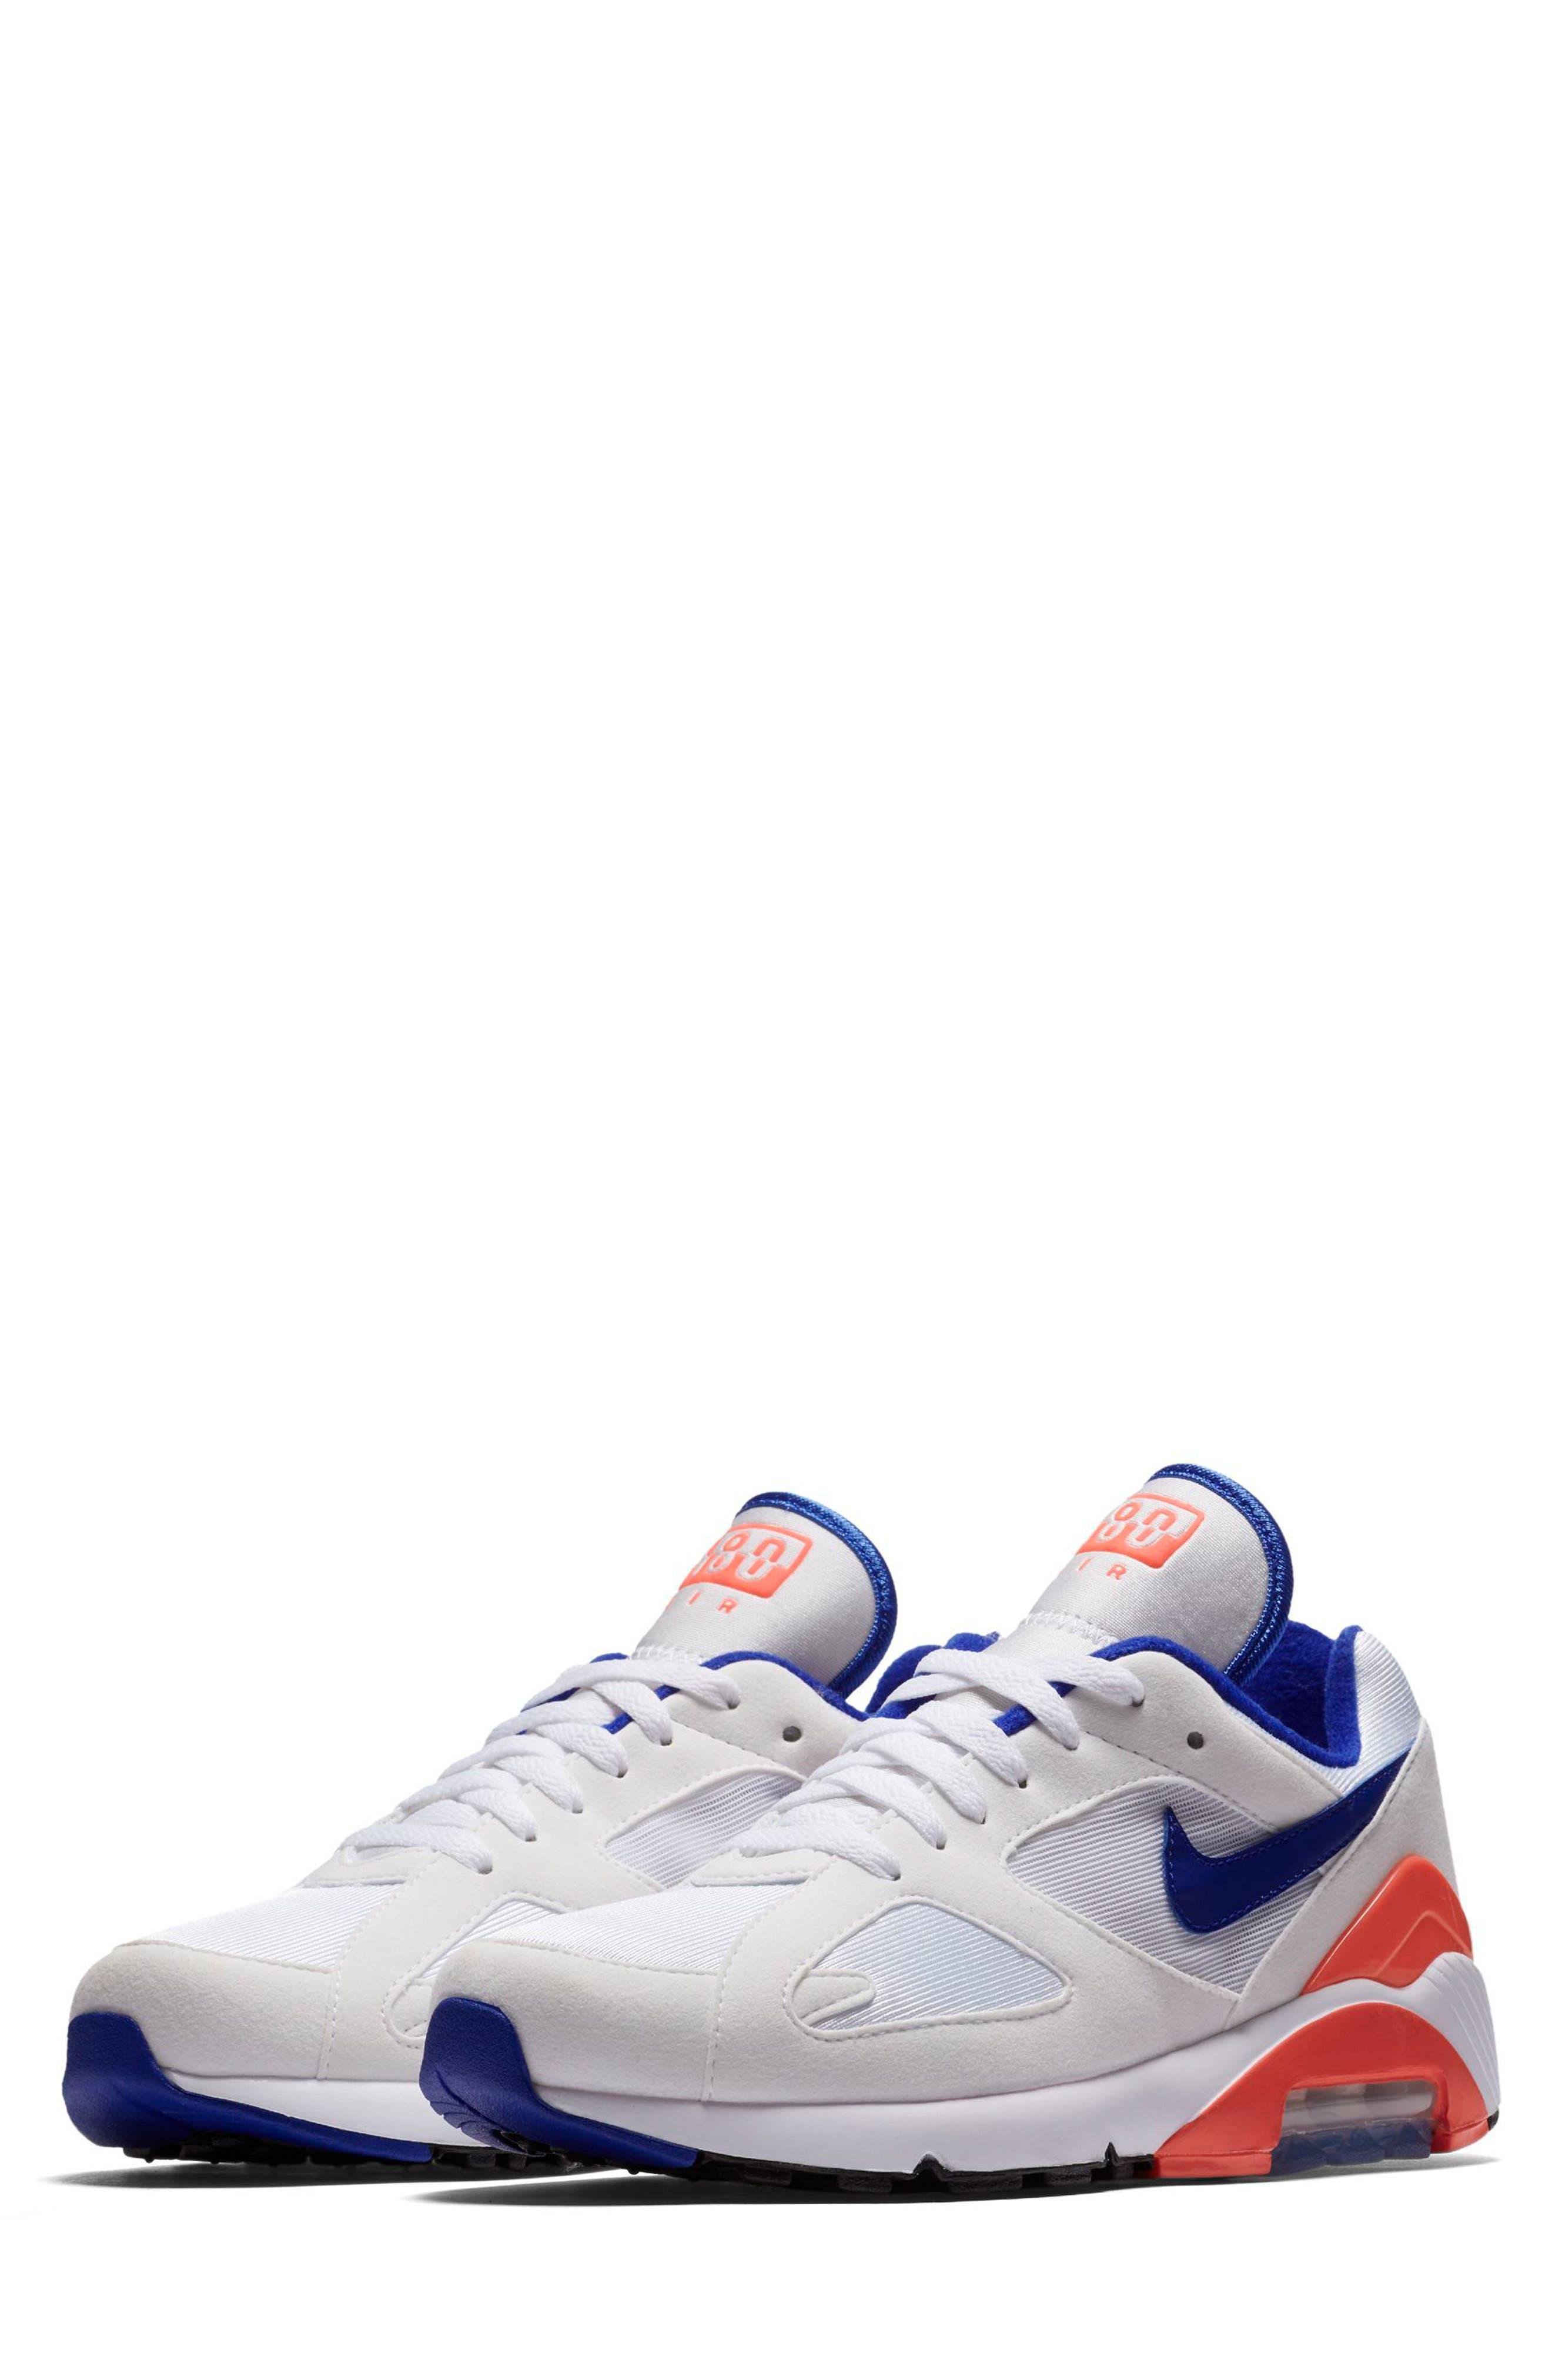 NIKE, Air Max 180 Sneaker, Main thumbnail 1, color, 100